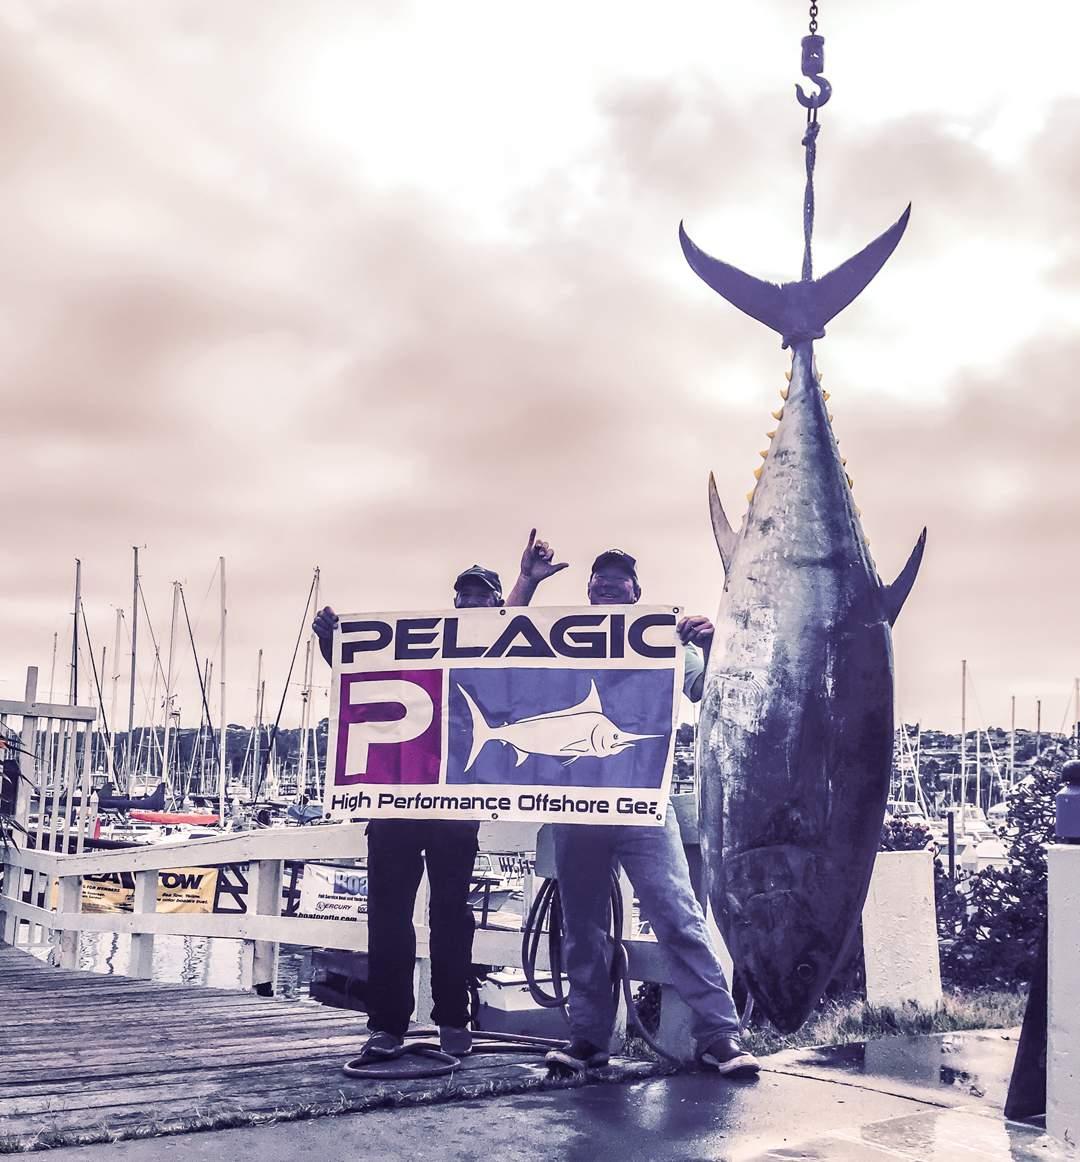 PELAGIC_Bluefin Tuna_Bob Woodard_SoCAL